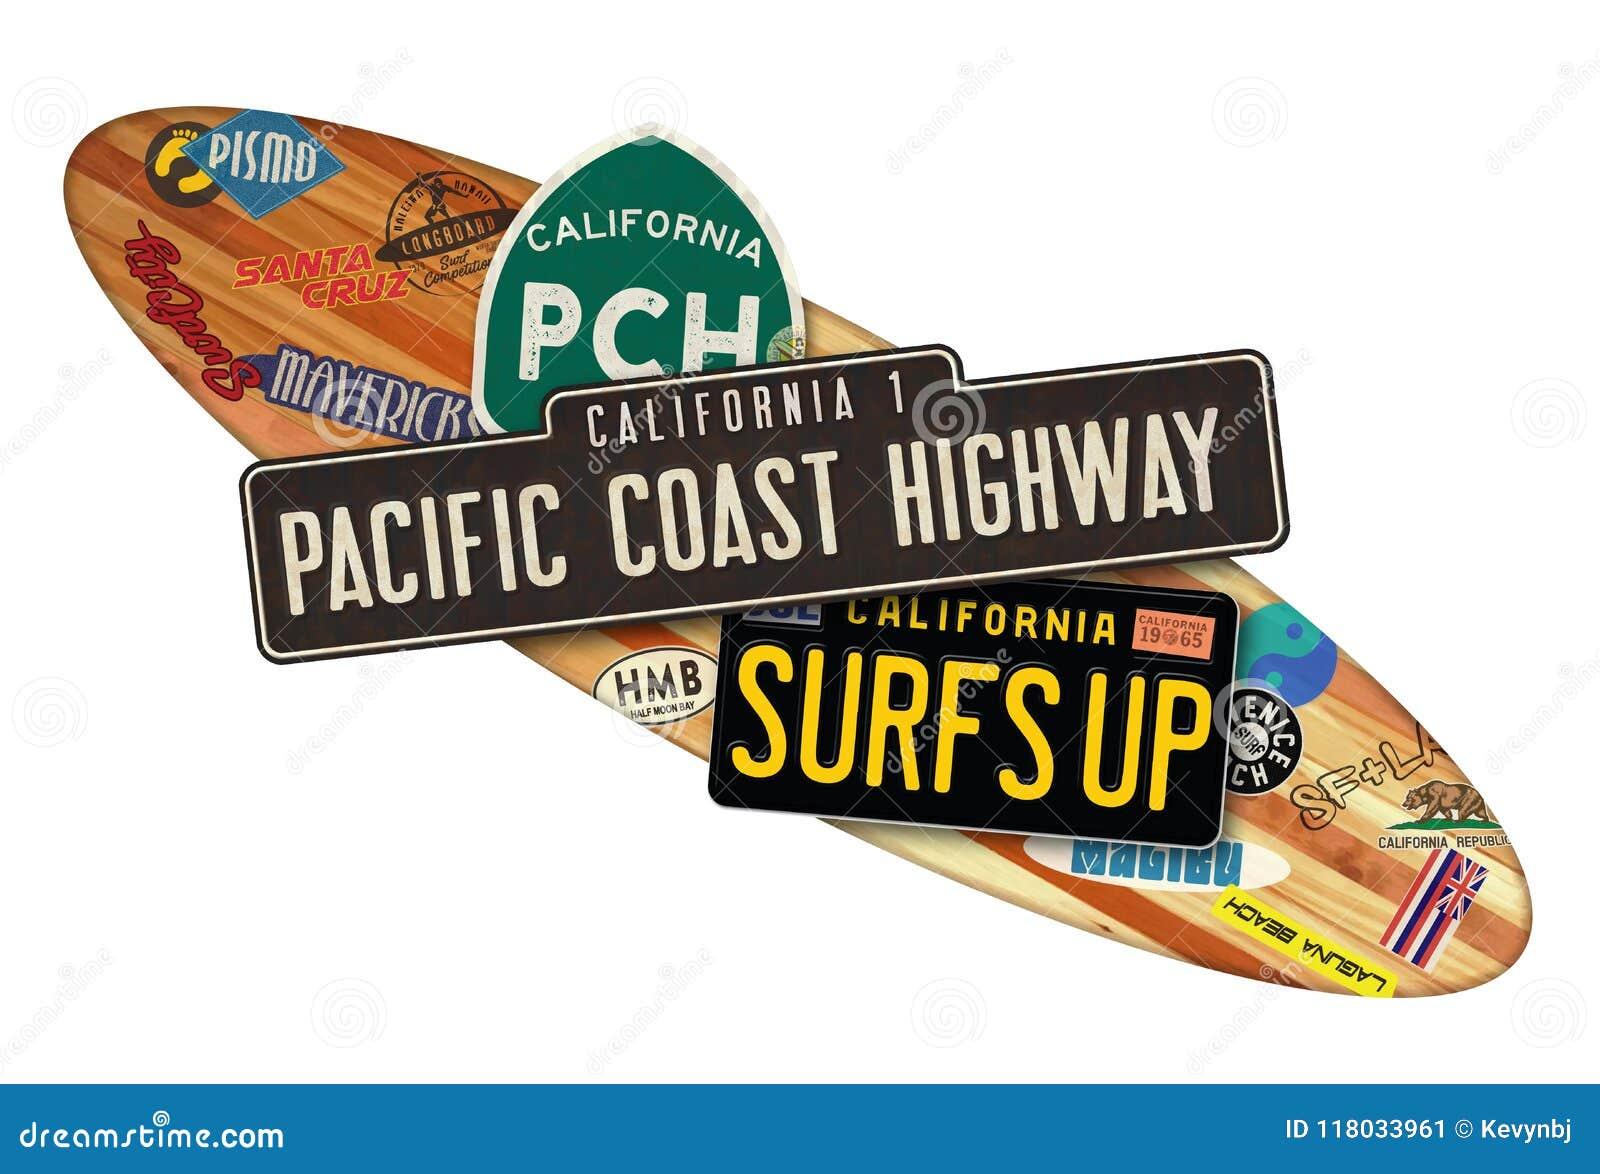 PCH California Surfboard Sign Stock Illustration - Illustration of